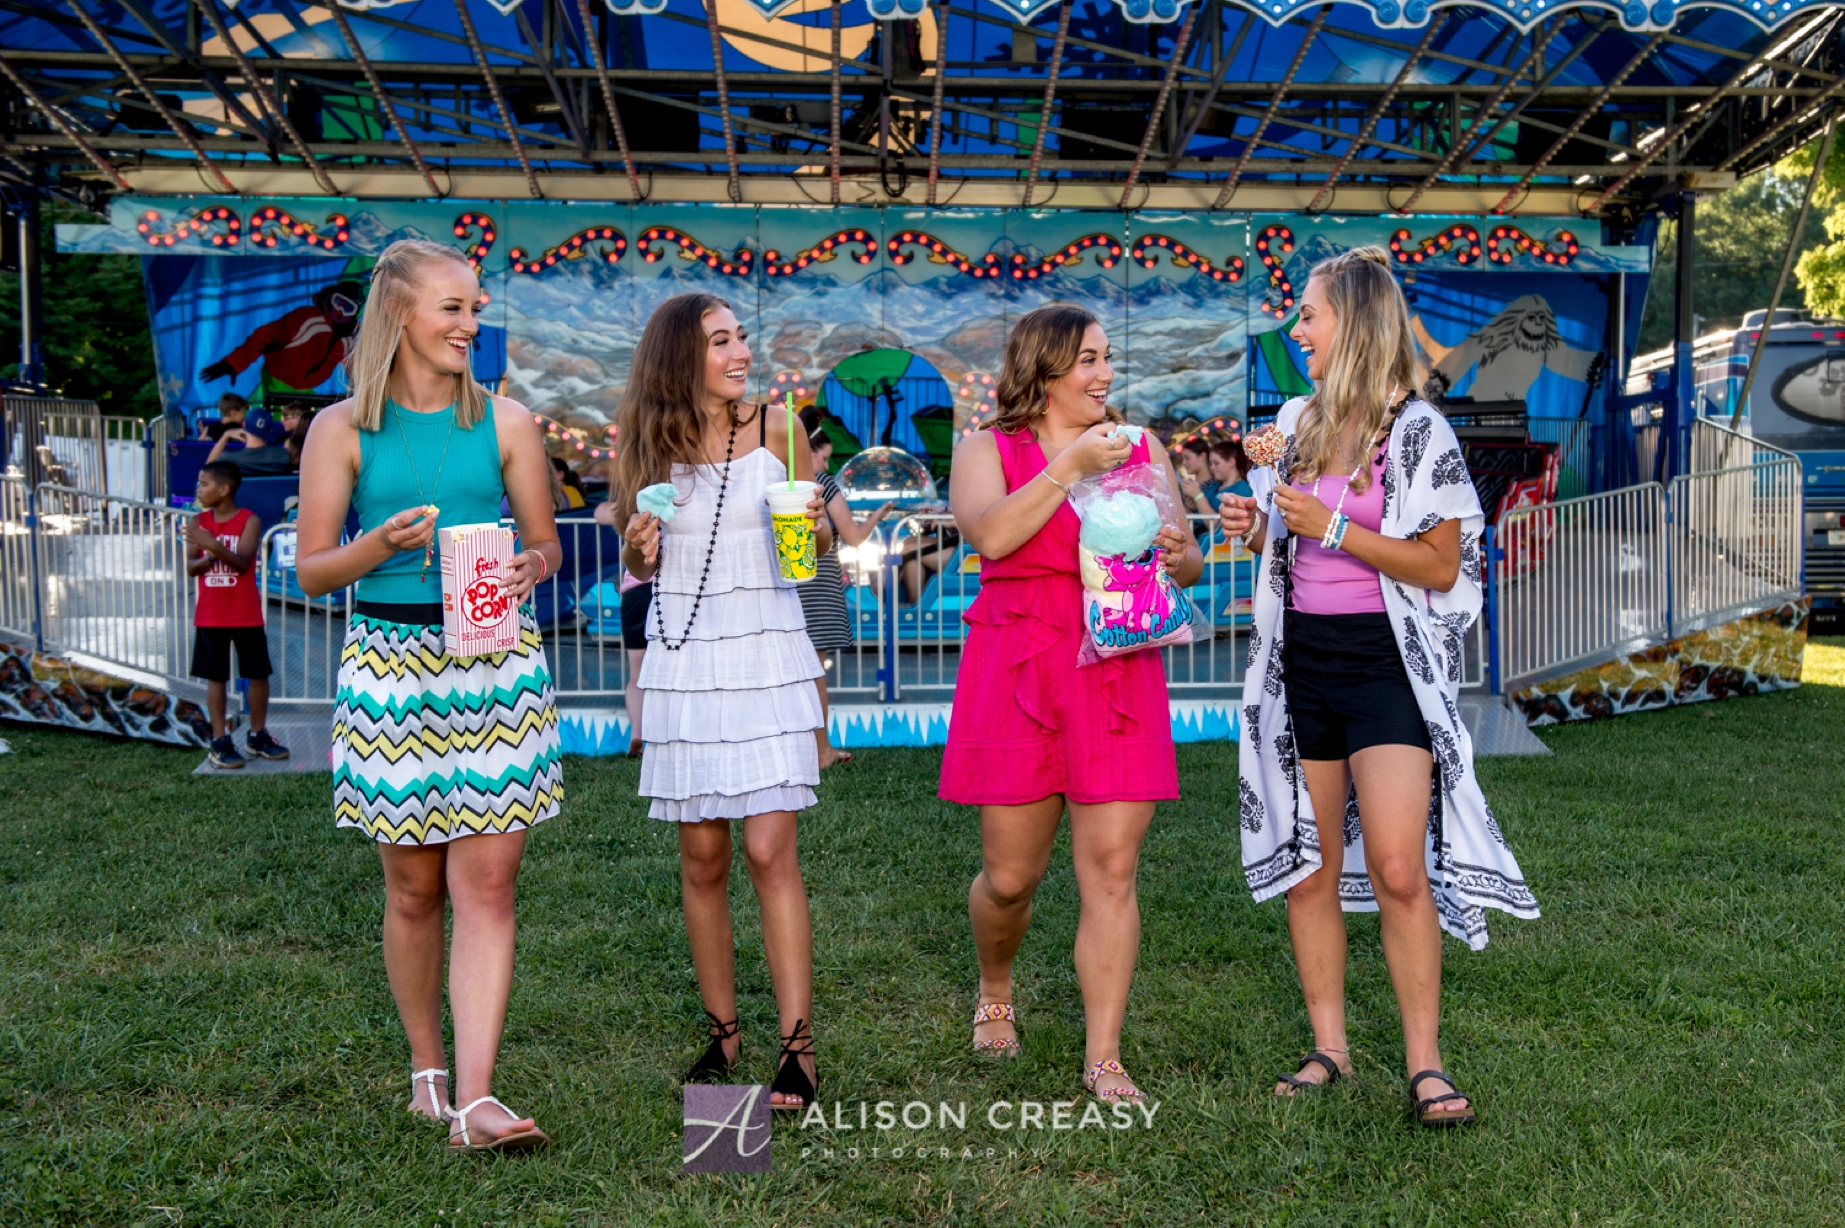 Alison-Creasy-Photography-Lynchburg-VA-Senior- Photographer_0015.jpg